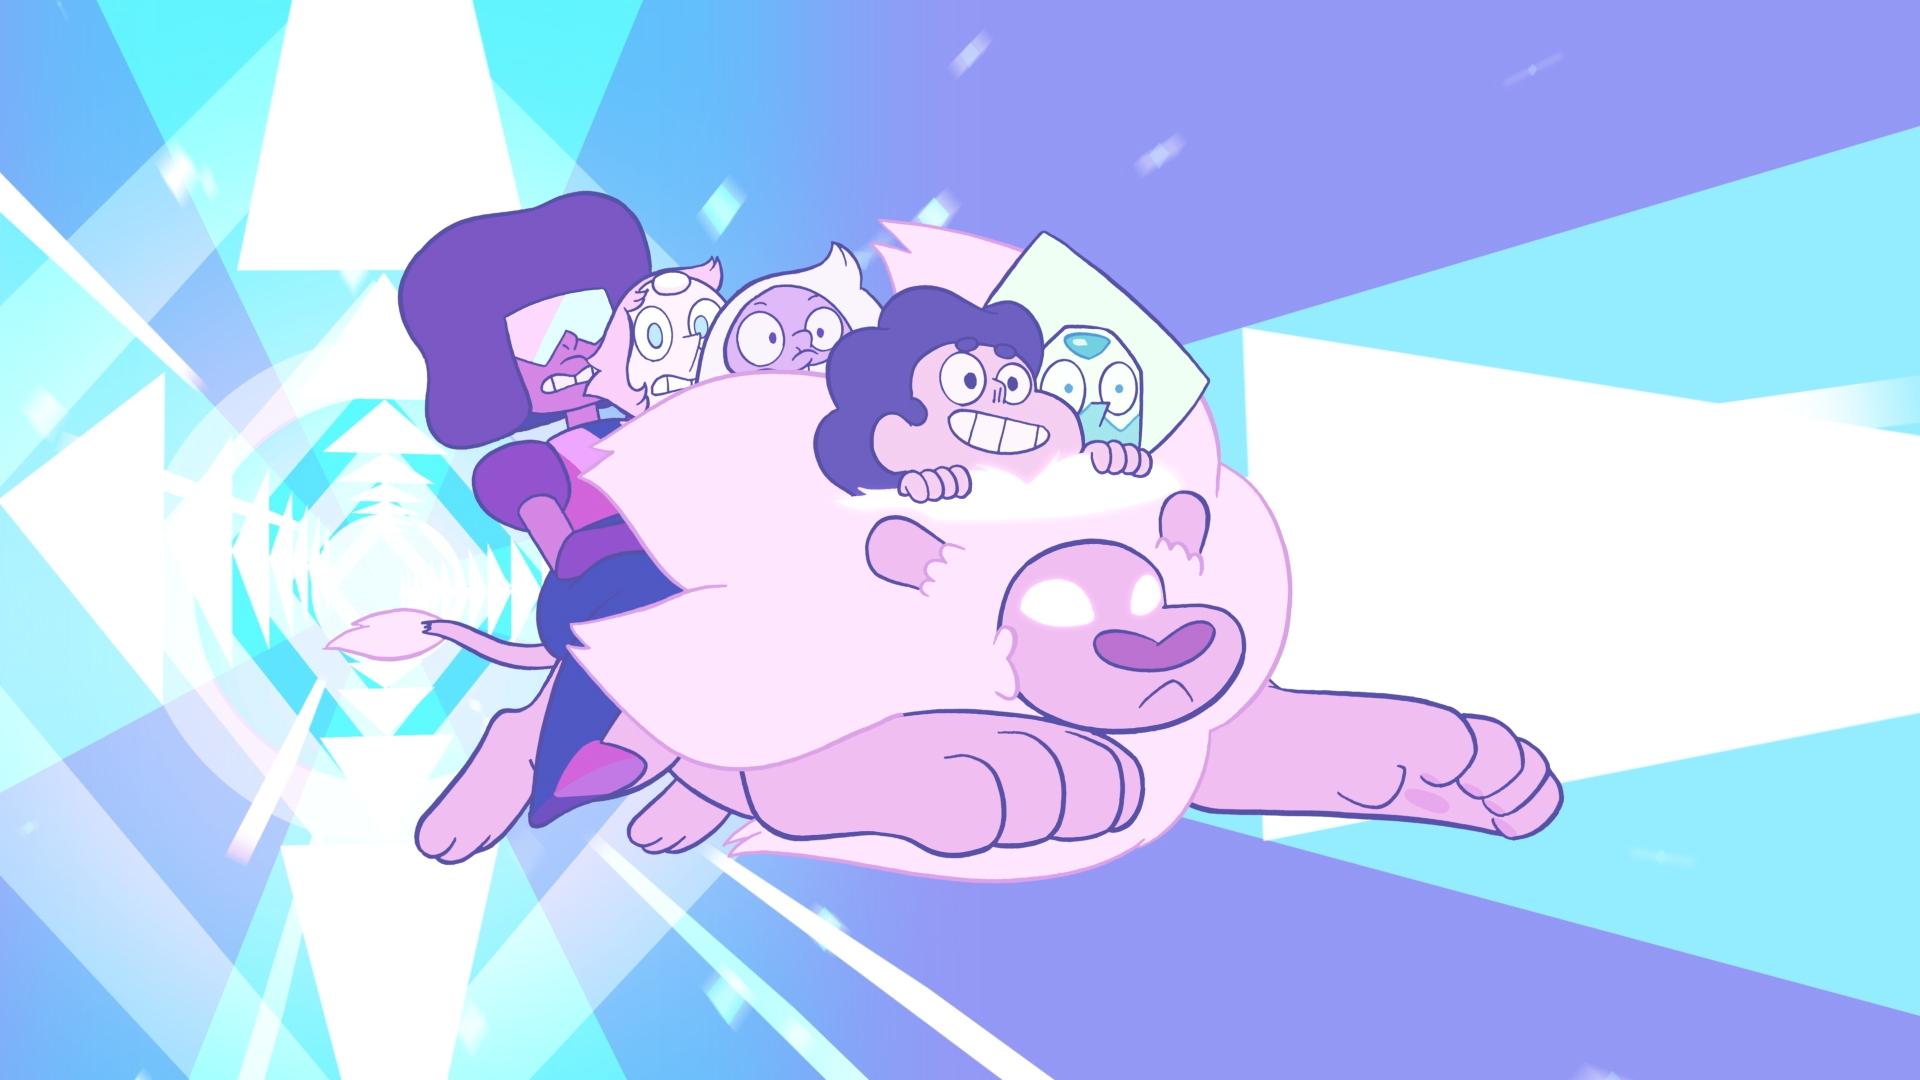 Steven_Universe_Season_2_Episode_76_still